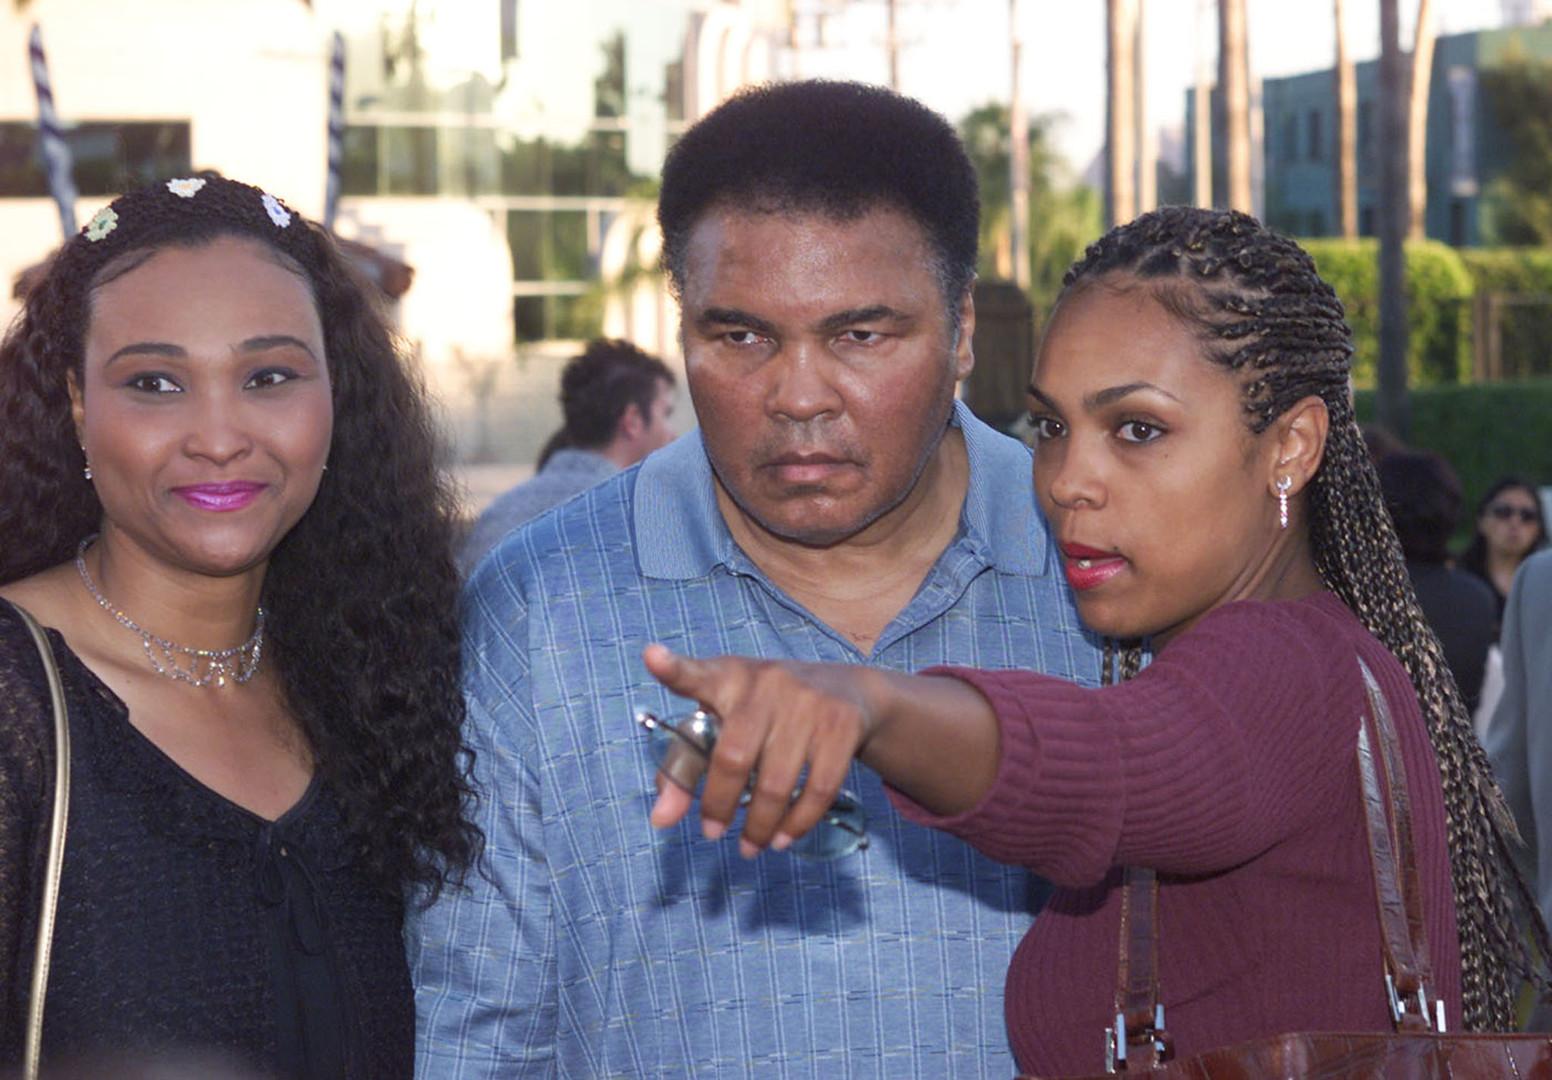 Дочь Мохаммеда Али рассказала о последних минутах жизни боксёра